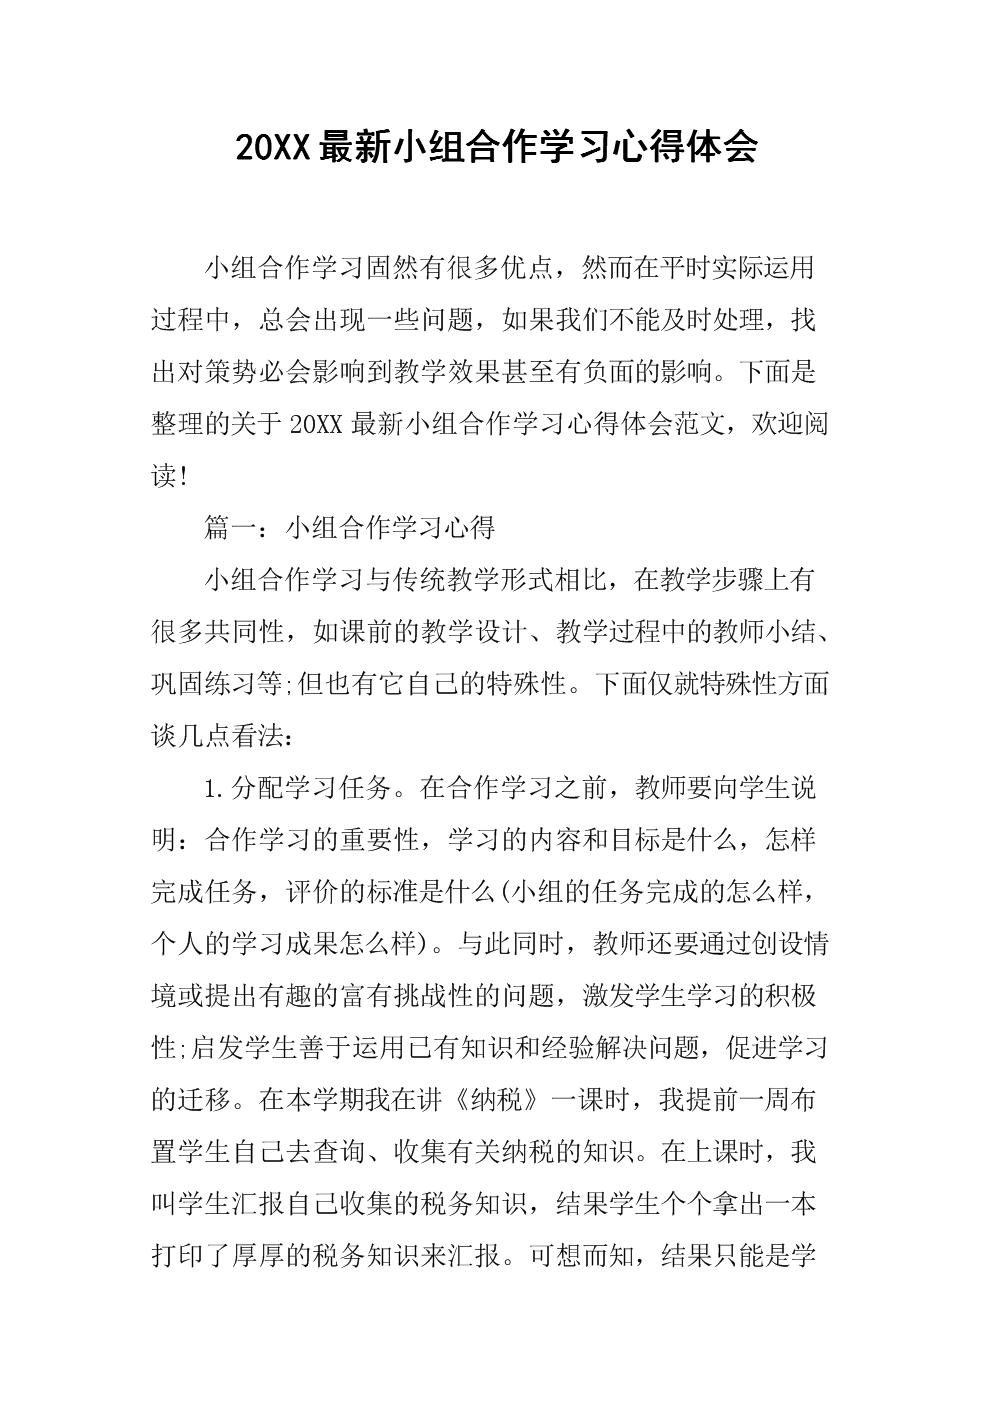 20xx小組批評合作心得體.docx自殺老師因學習初中優等生圖片